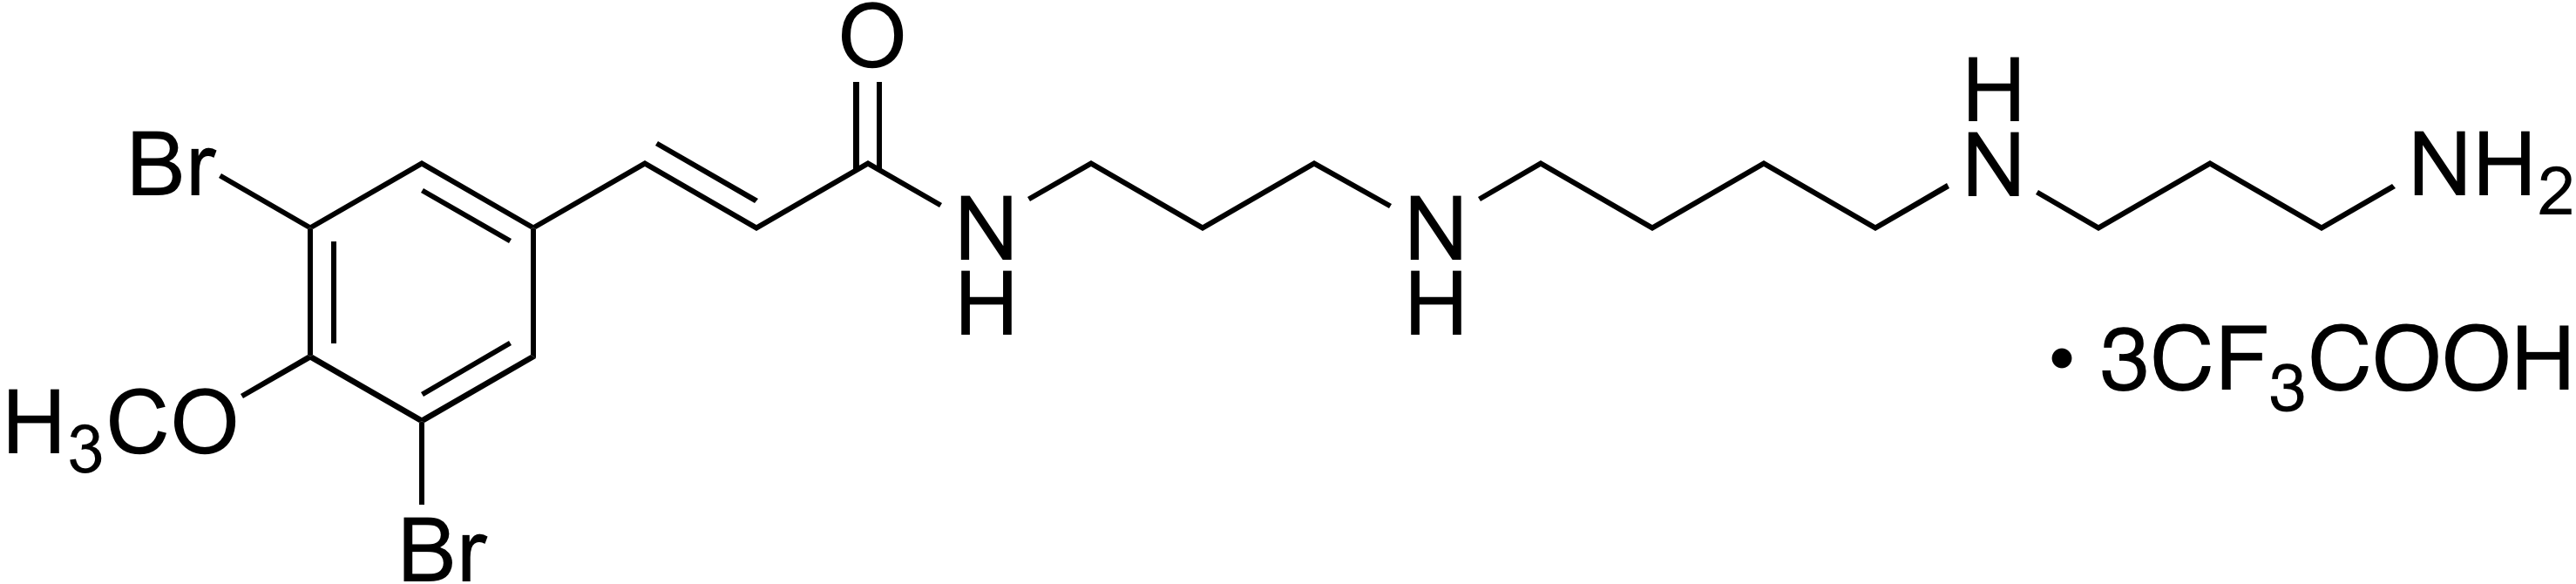 Ianthelliformisamine Atrifluoroacetate (1:3)